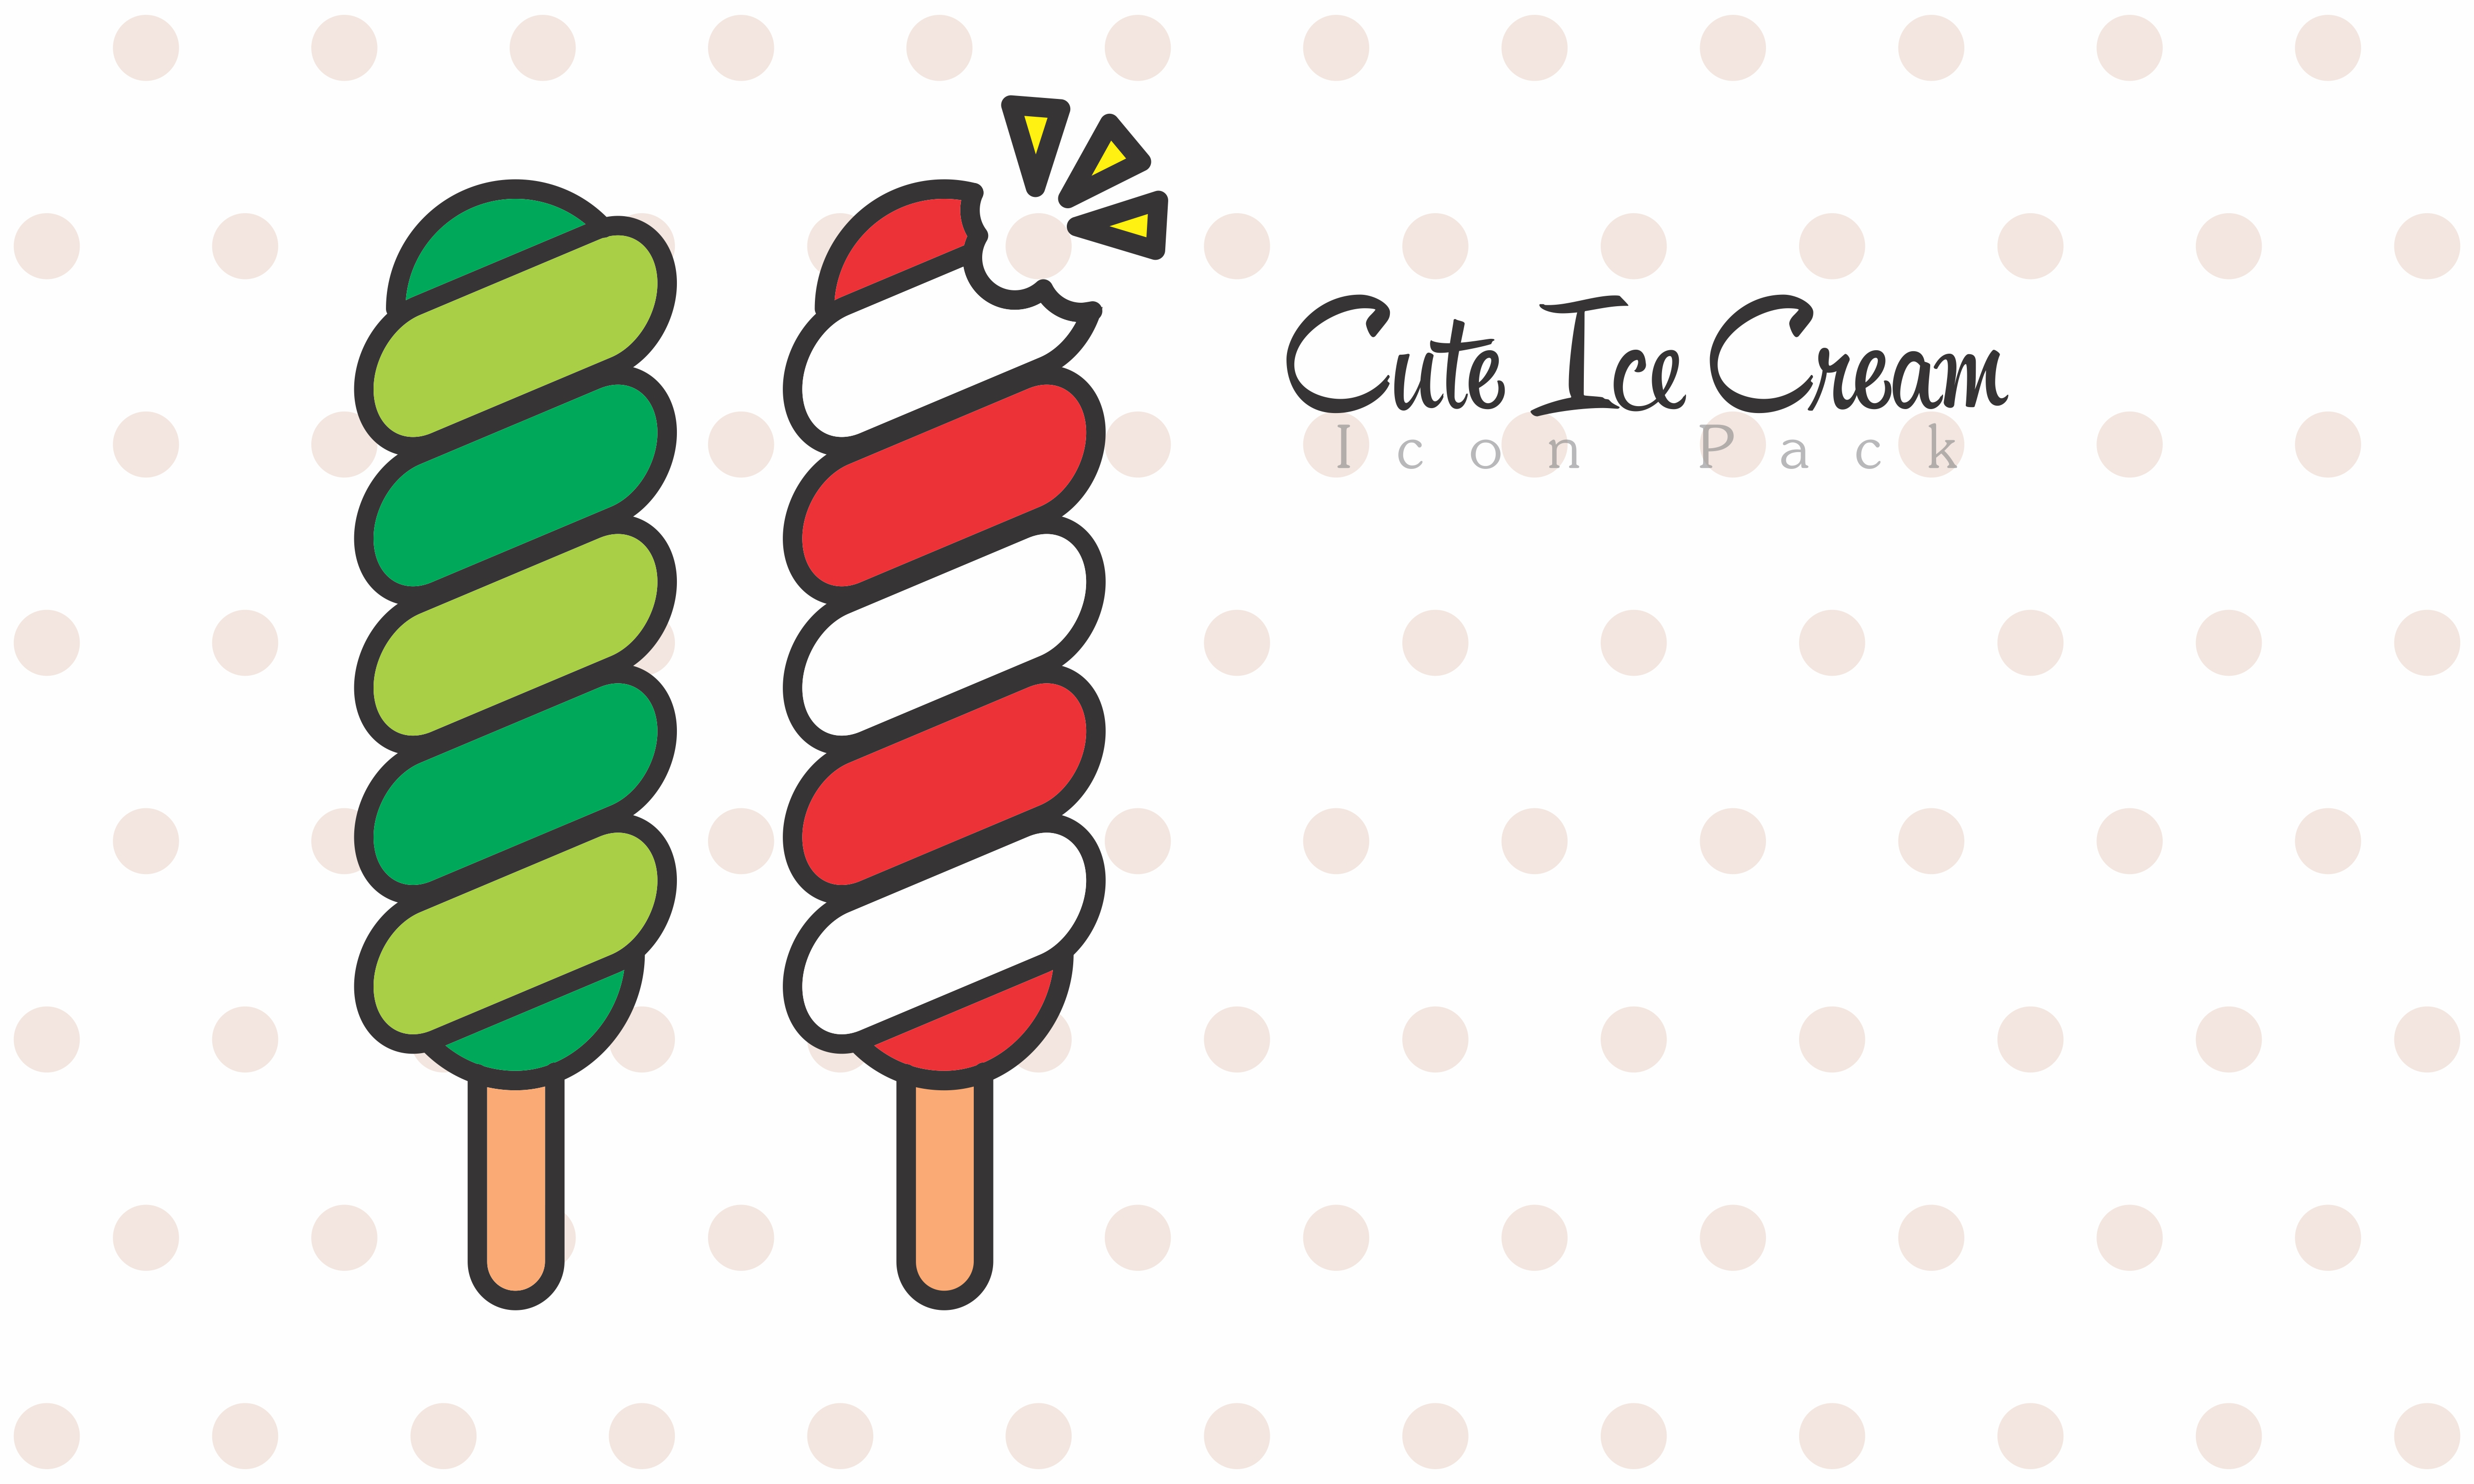 Cute Ice Cream Icon Pack example image 1